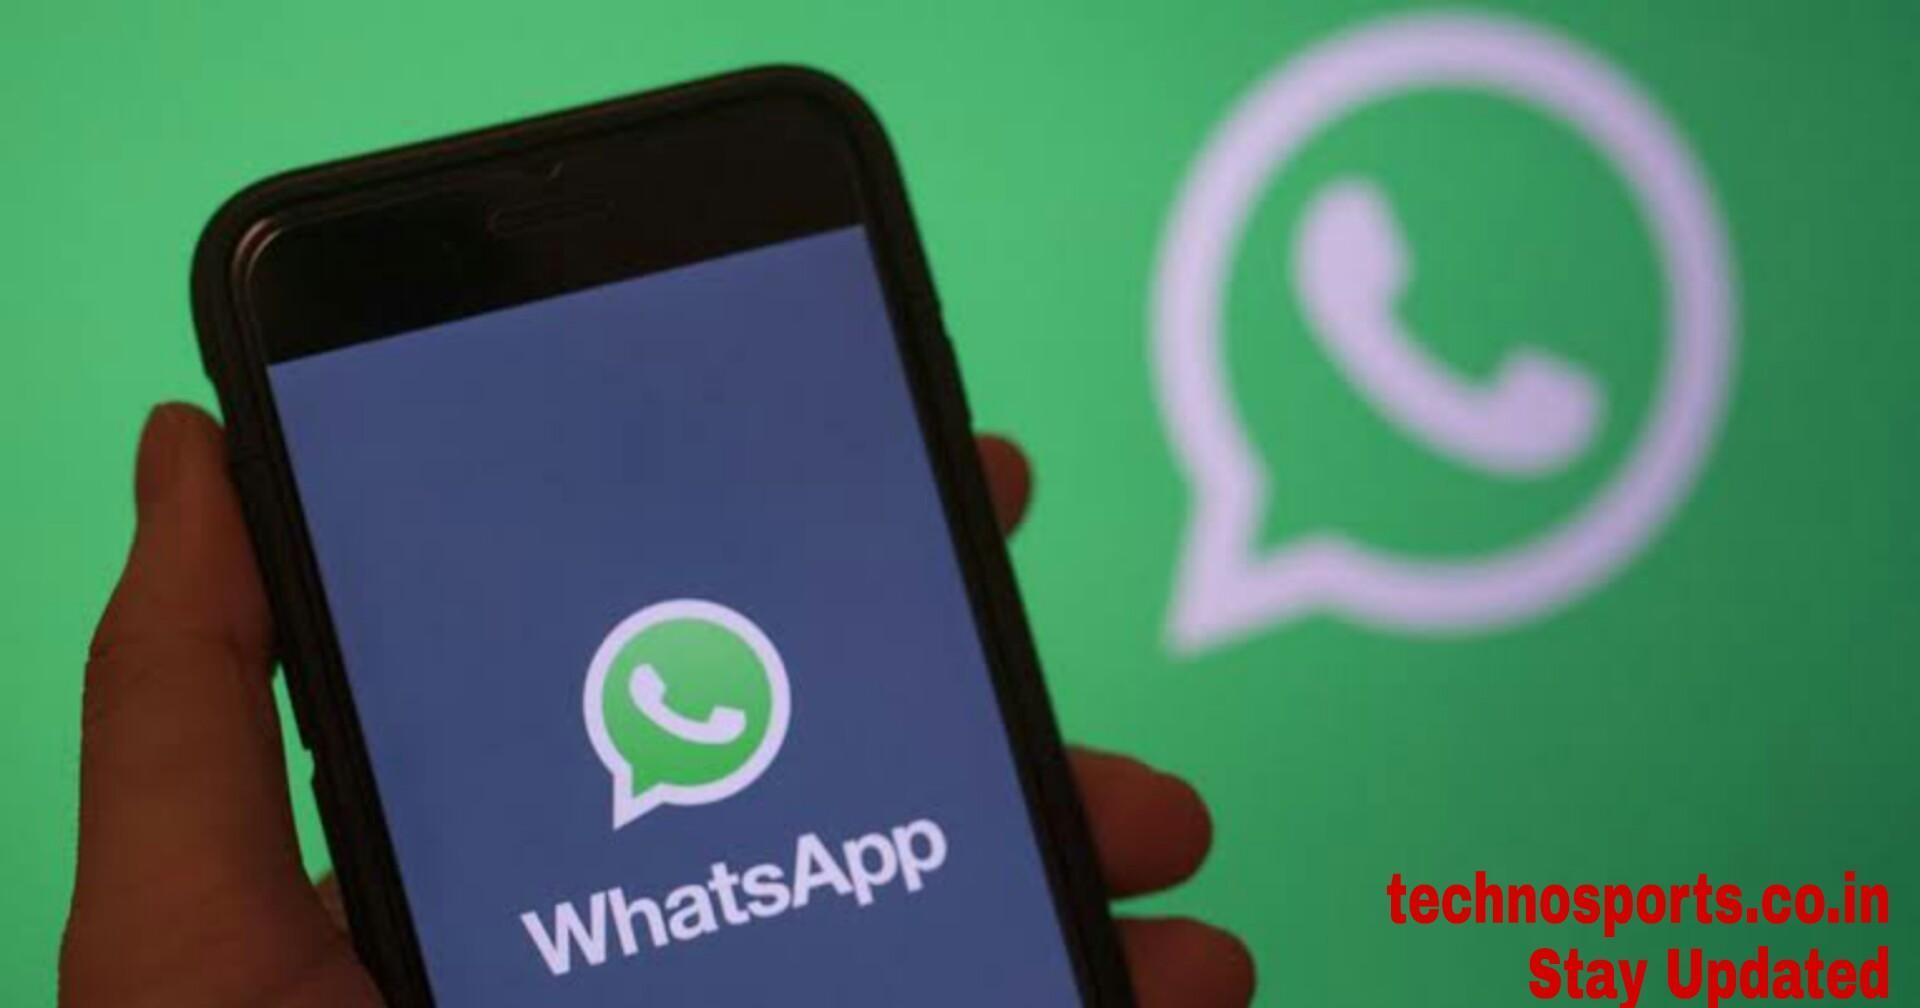 WhatsApp_technosports.co.in